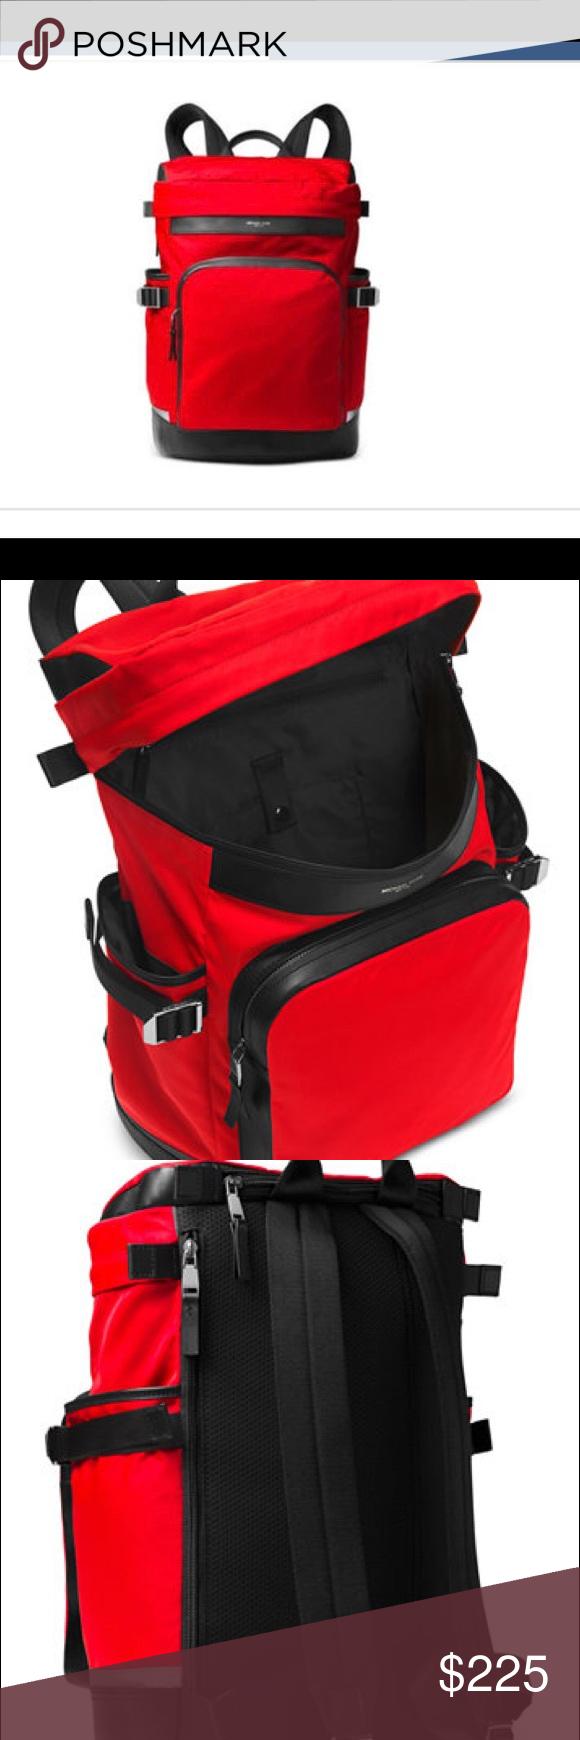 368ec437121fd4 Michael Kors Ken Cycling Backpack Multifuncional Michael Kors Cycling  Backpack. Ideal for hiking or biking